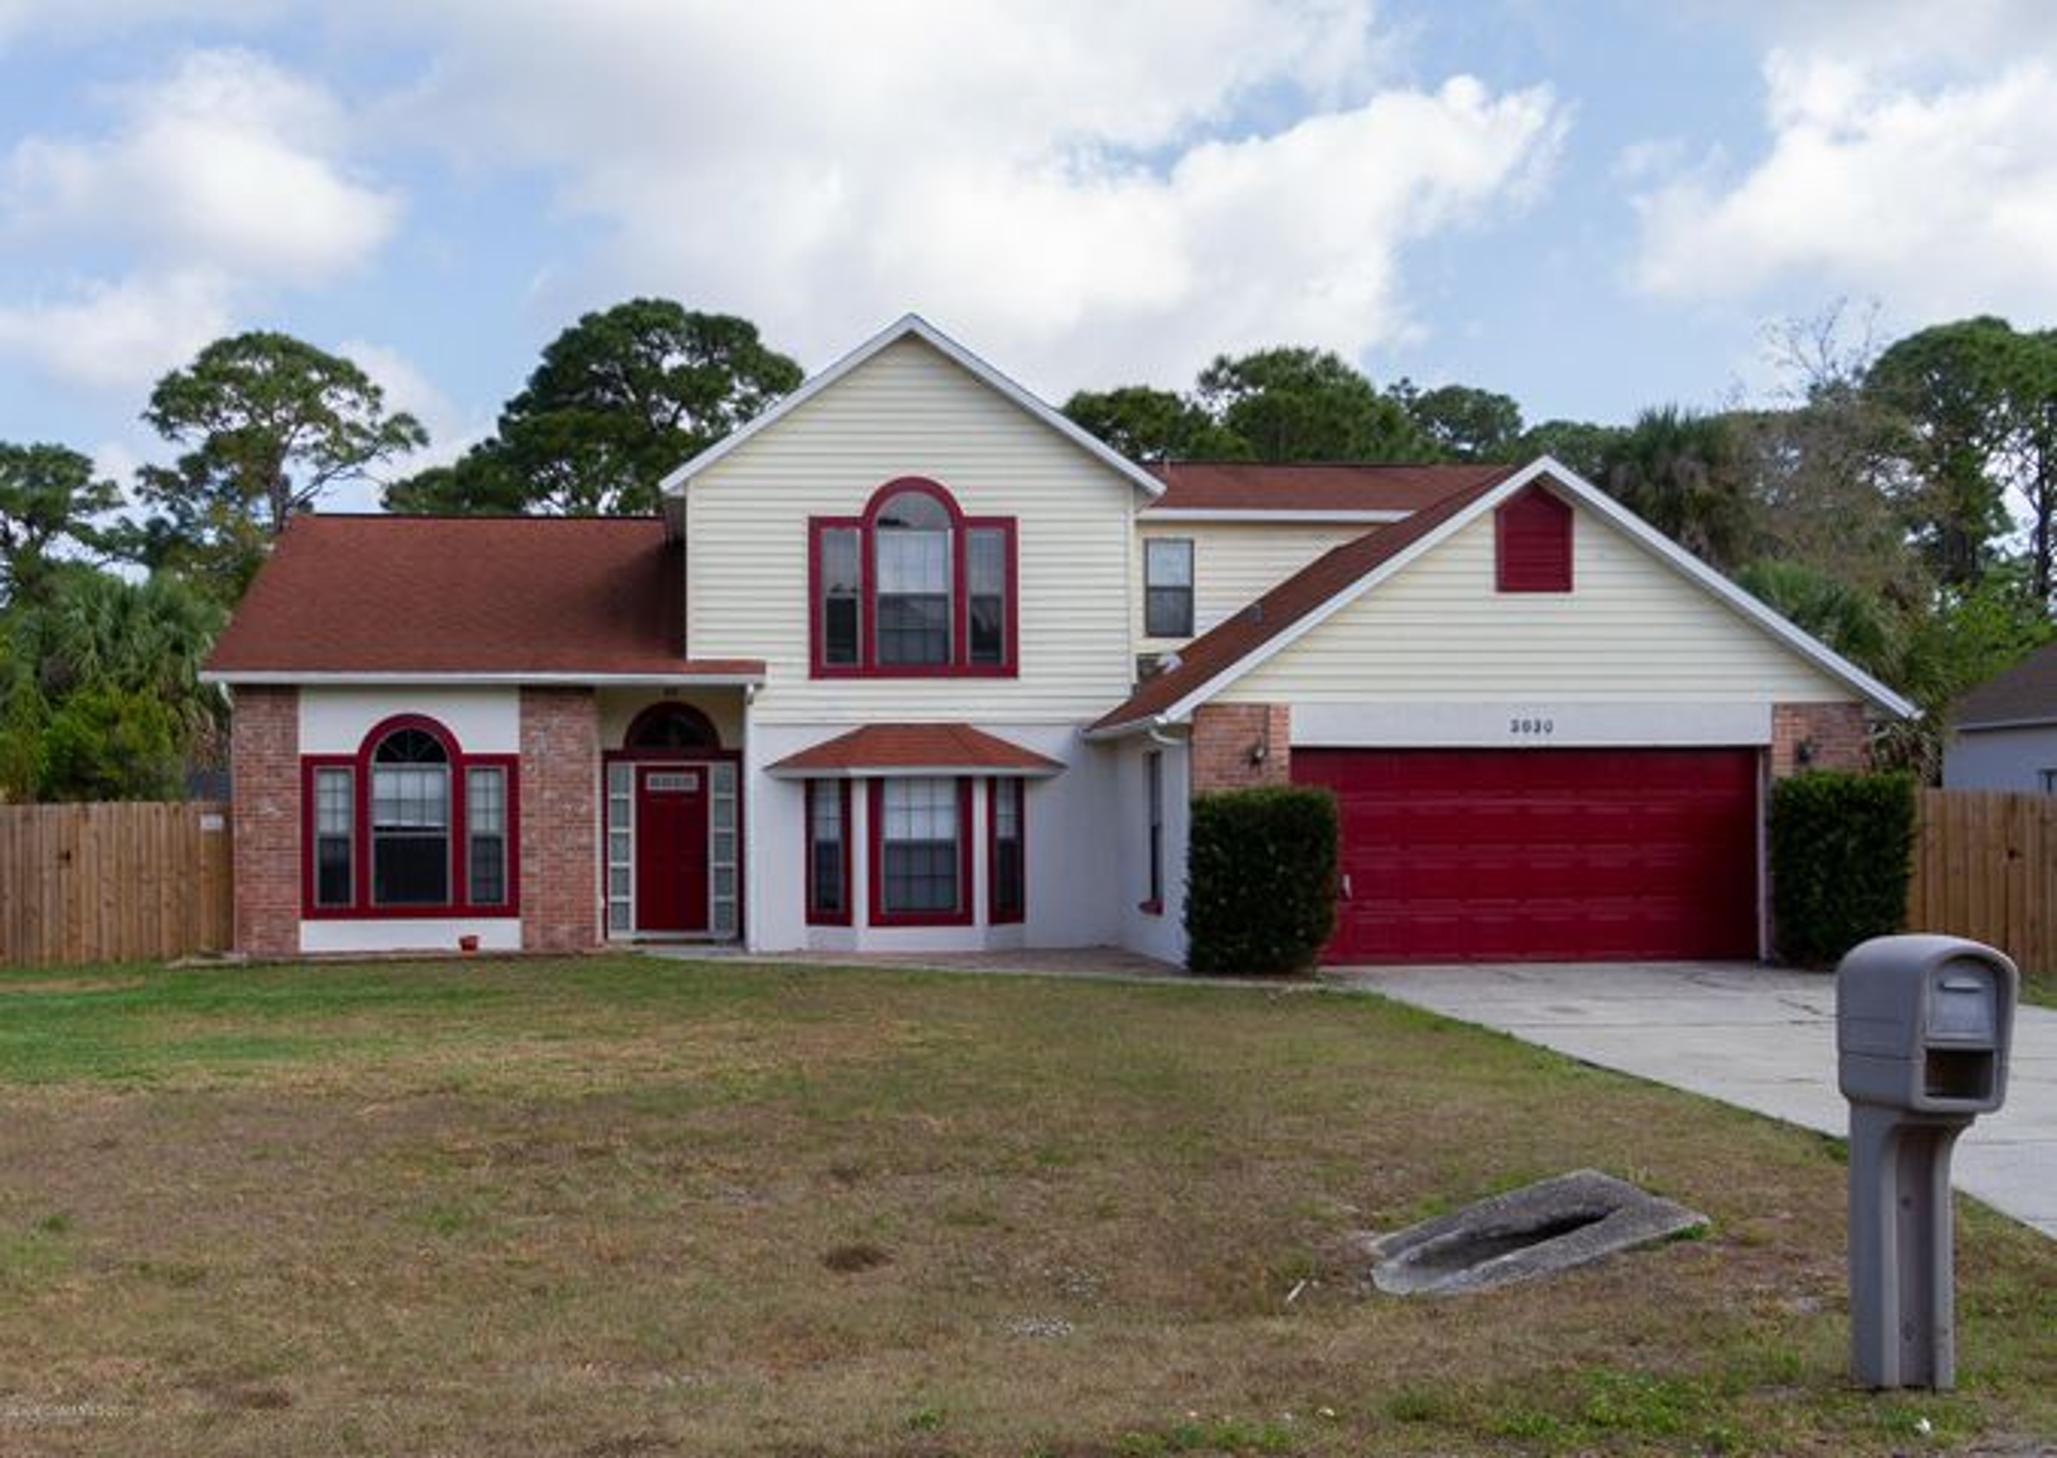 2830 Saint Marks Drive, Titusville, FL 32780